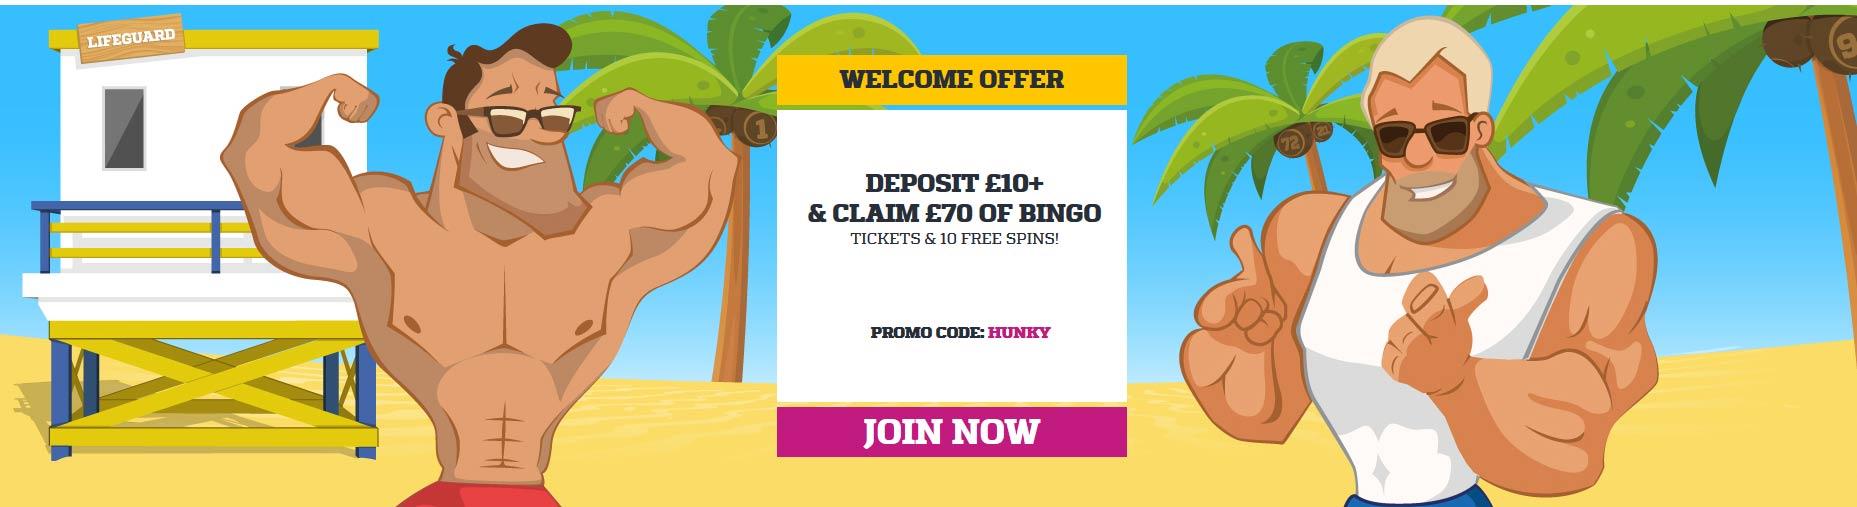 Hunky Bingo Welcome Offer